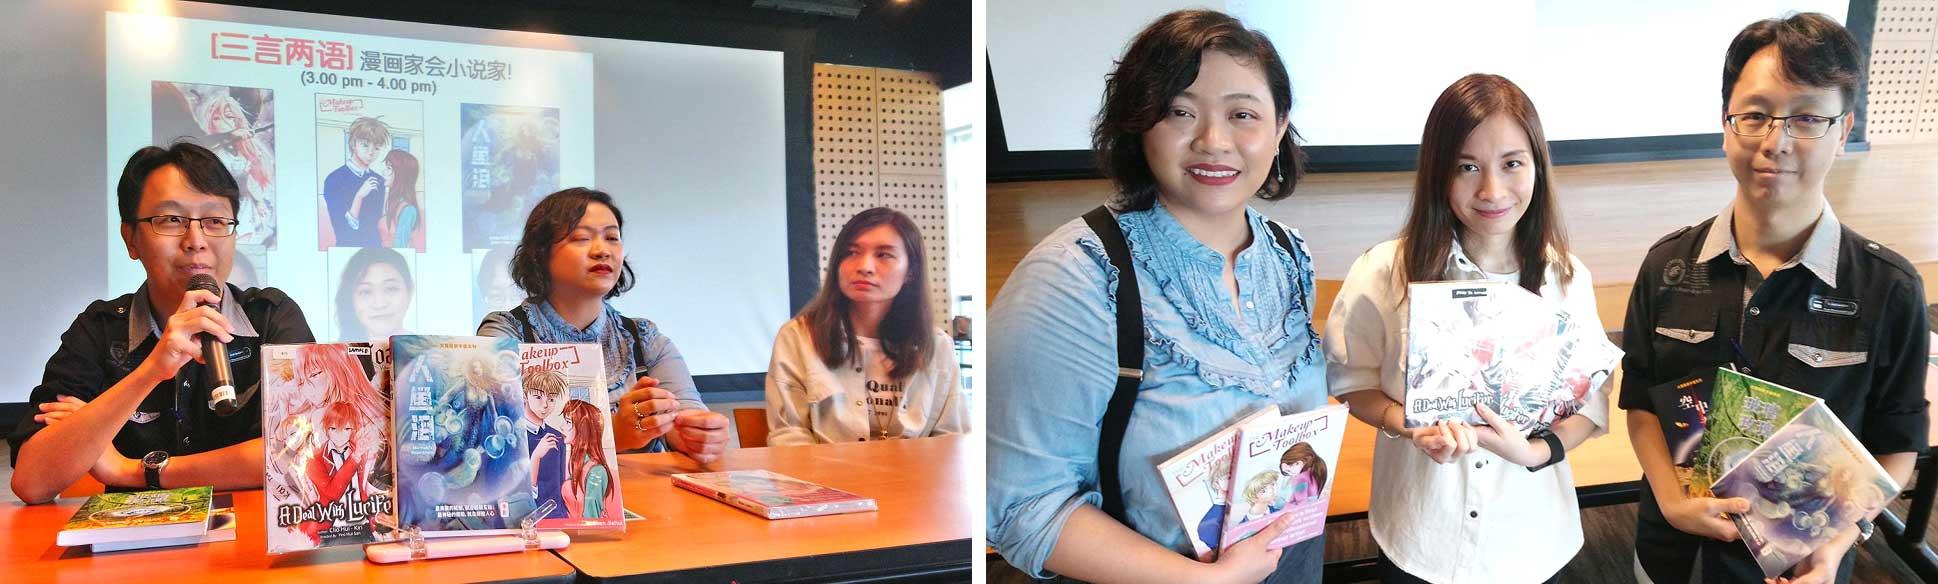 Talk session by three prominent local comic artists and novelist – Clio Hui Kiri, Shen Jiahui and Brian Lee.